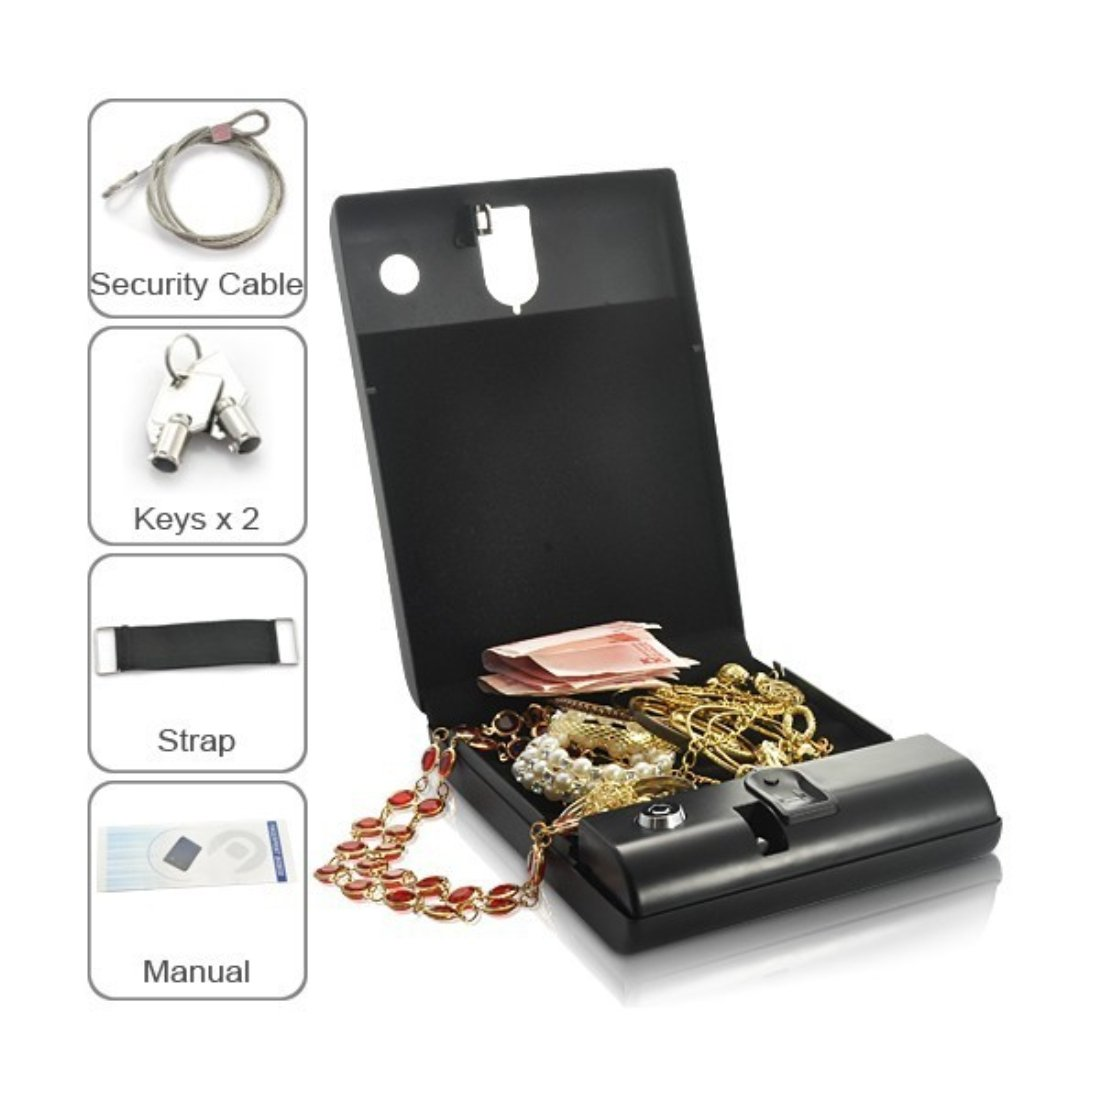 Portable Fingerprint security box Biometric Fingerprint Car Gun Safe Electronic Digital Fingerprint Scanner Safe Box for Pistol Gun Jewelry Money-Black